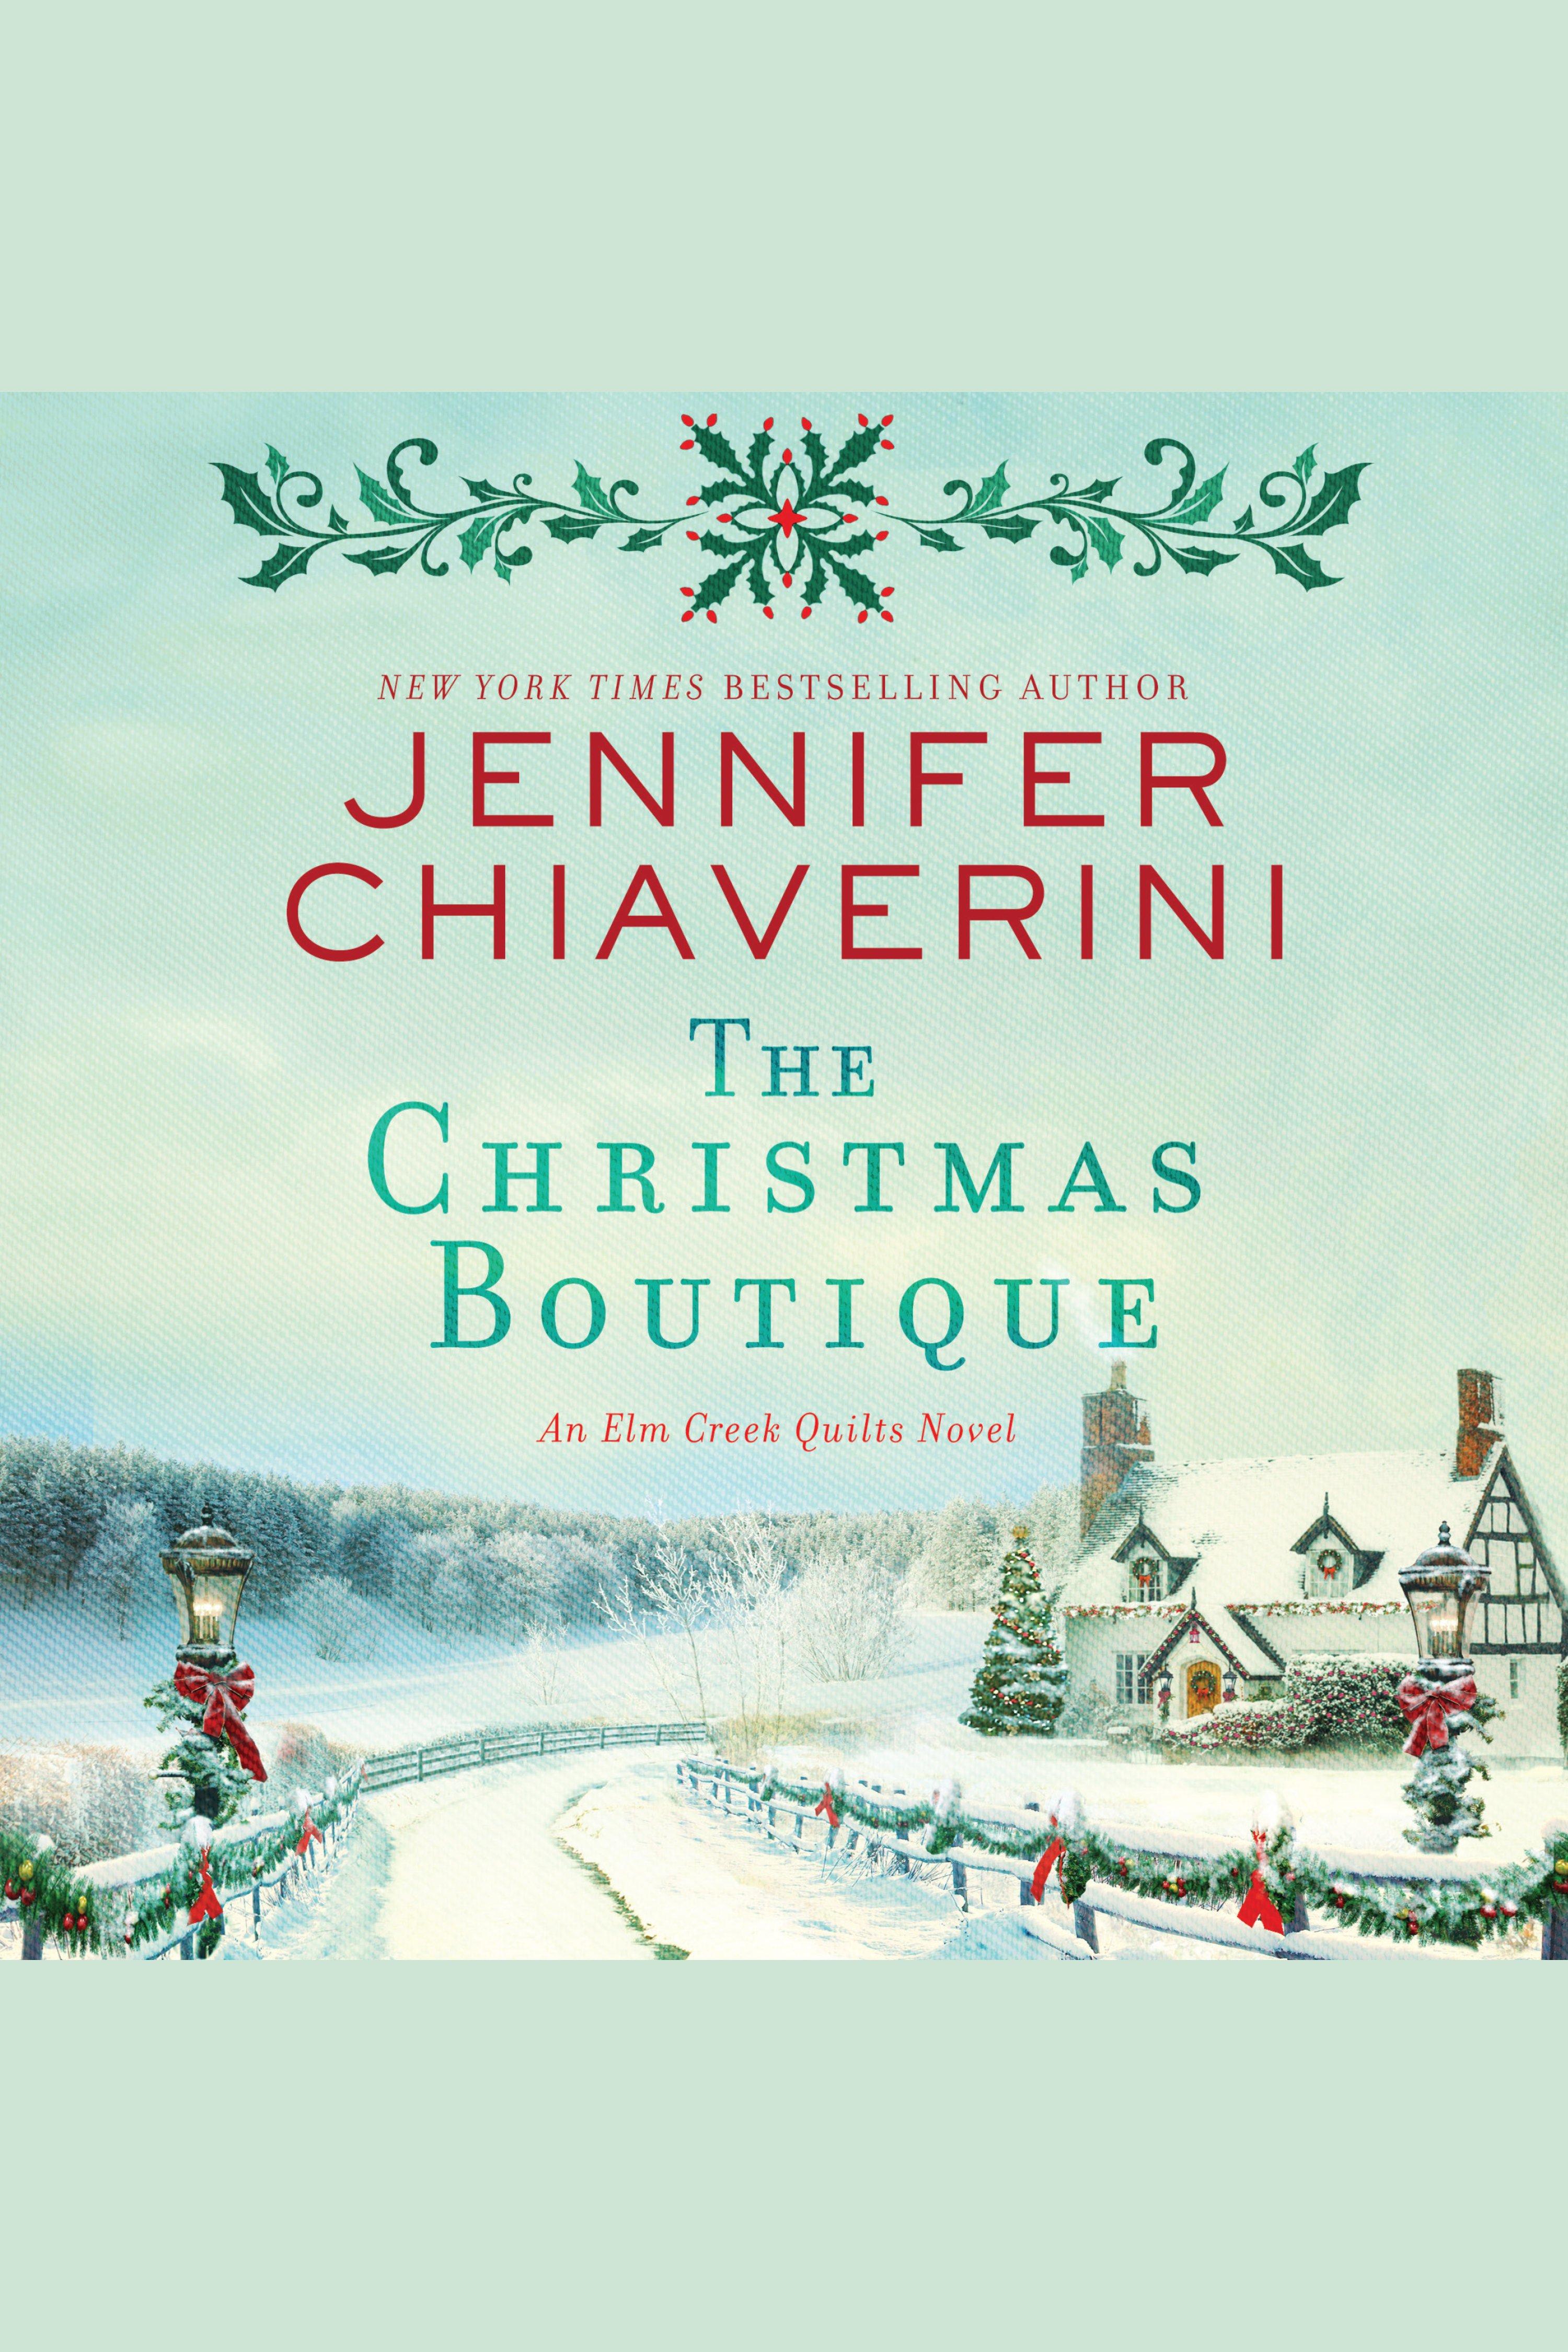 Christmas Boutique, The An Elm Creek Quilts Novel